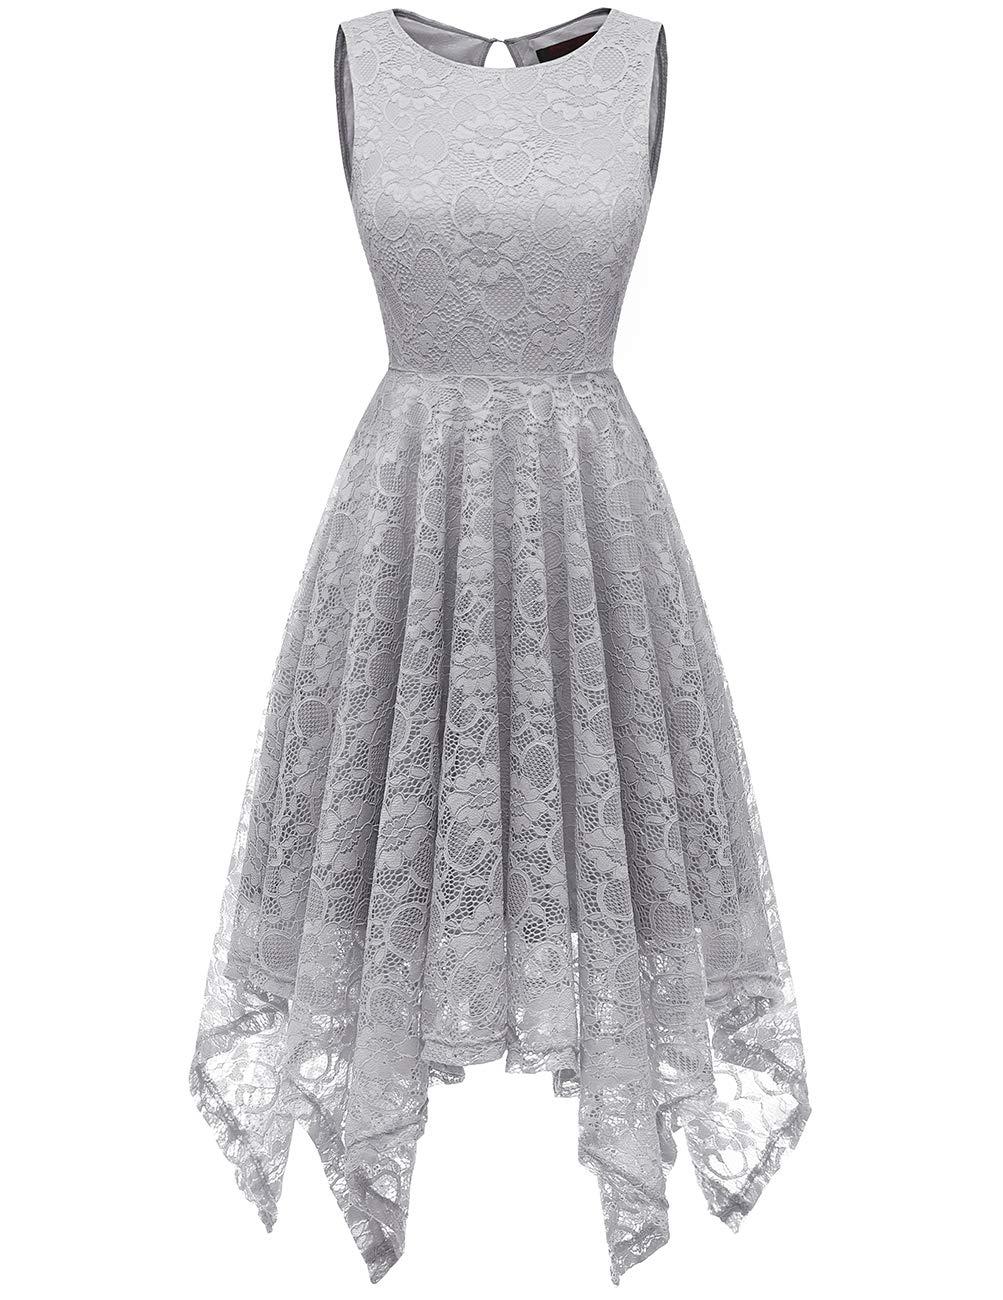 13b6b54cafc DRESSTELLS Women s Bridesmaid Floral Lace Handkerchief Hem Cocktail Party  Dress Grey 3XL